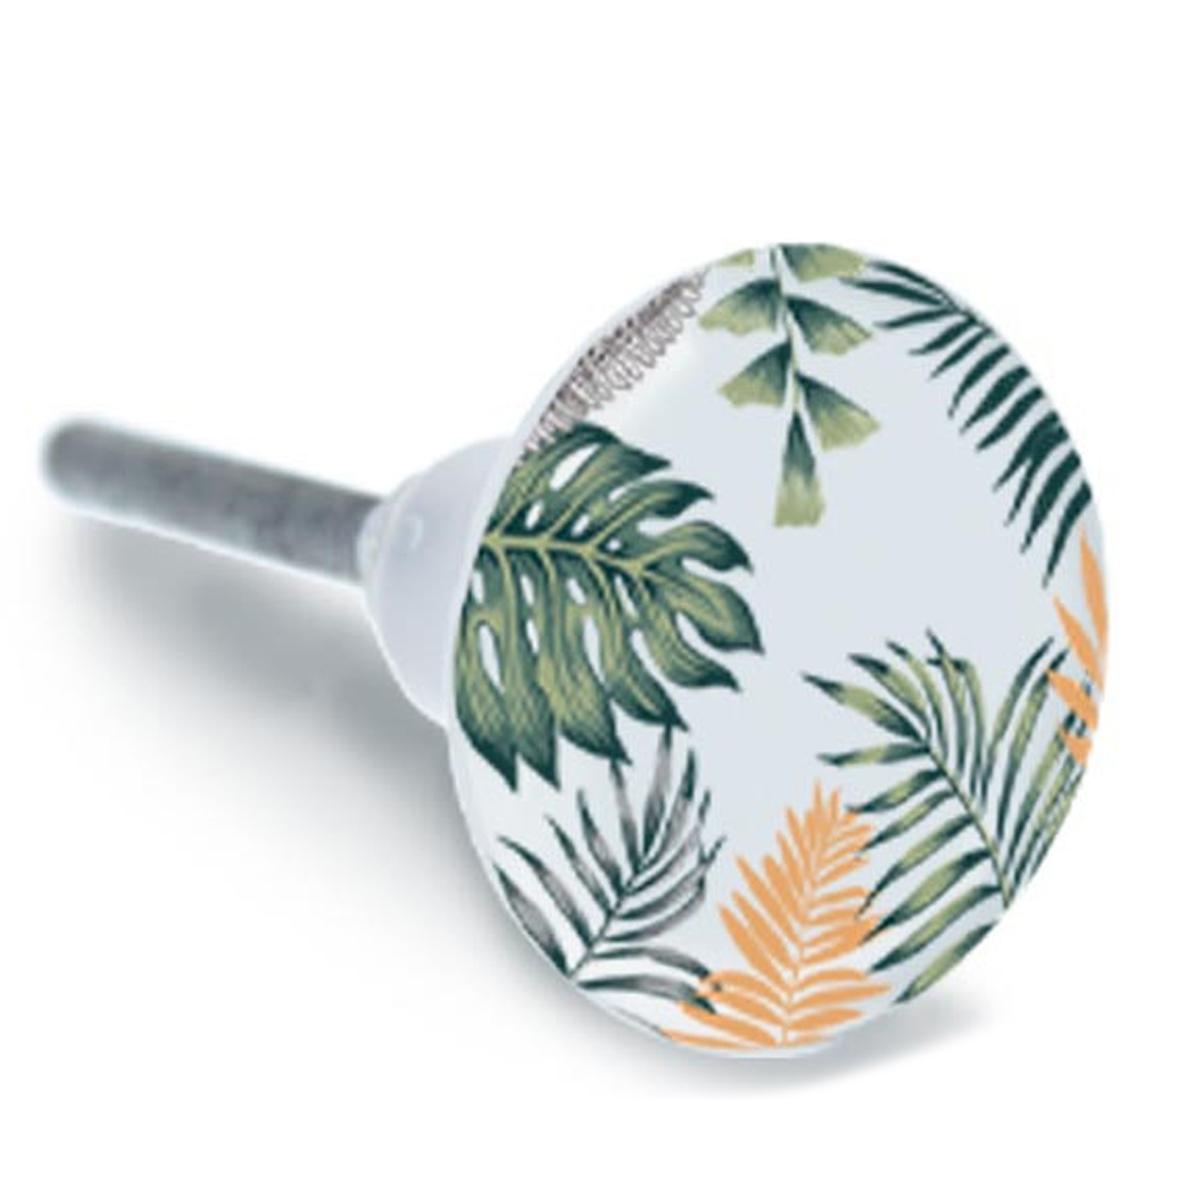 Bouton meuble céramique \'Tropical\' vert jaune - 65x35 mm - [A1934]